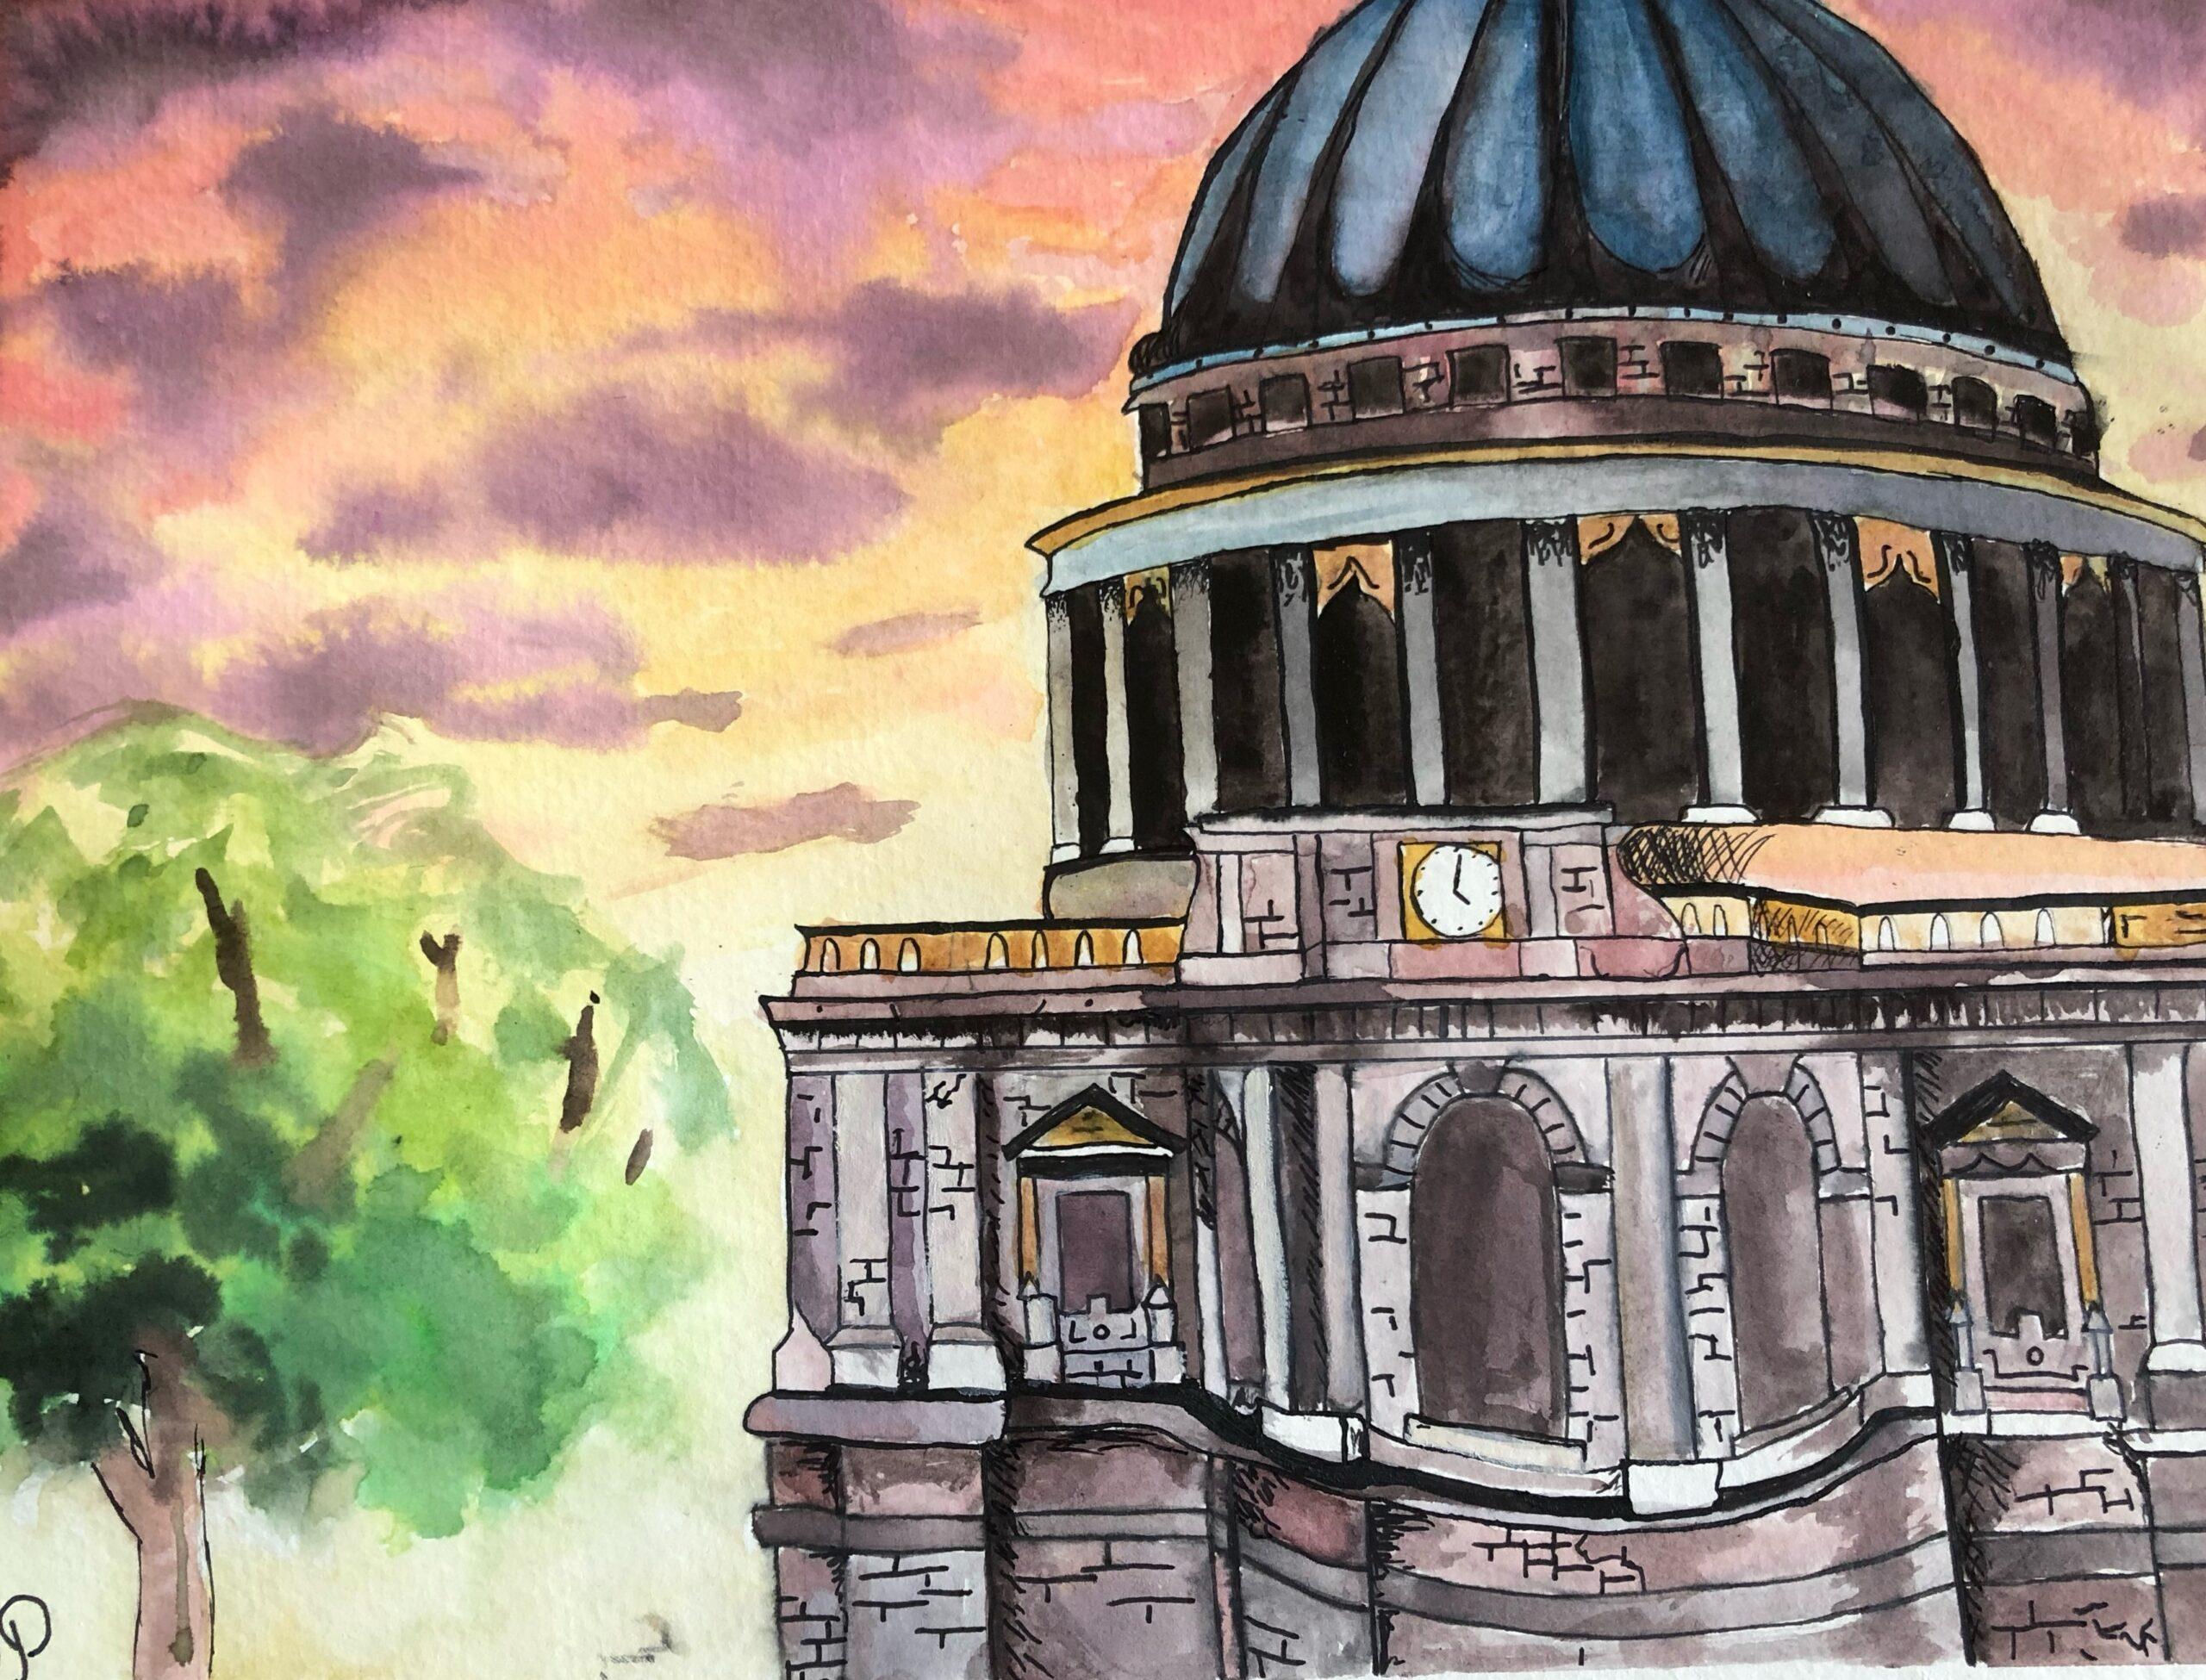 rotunda in watercolor